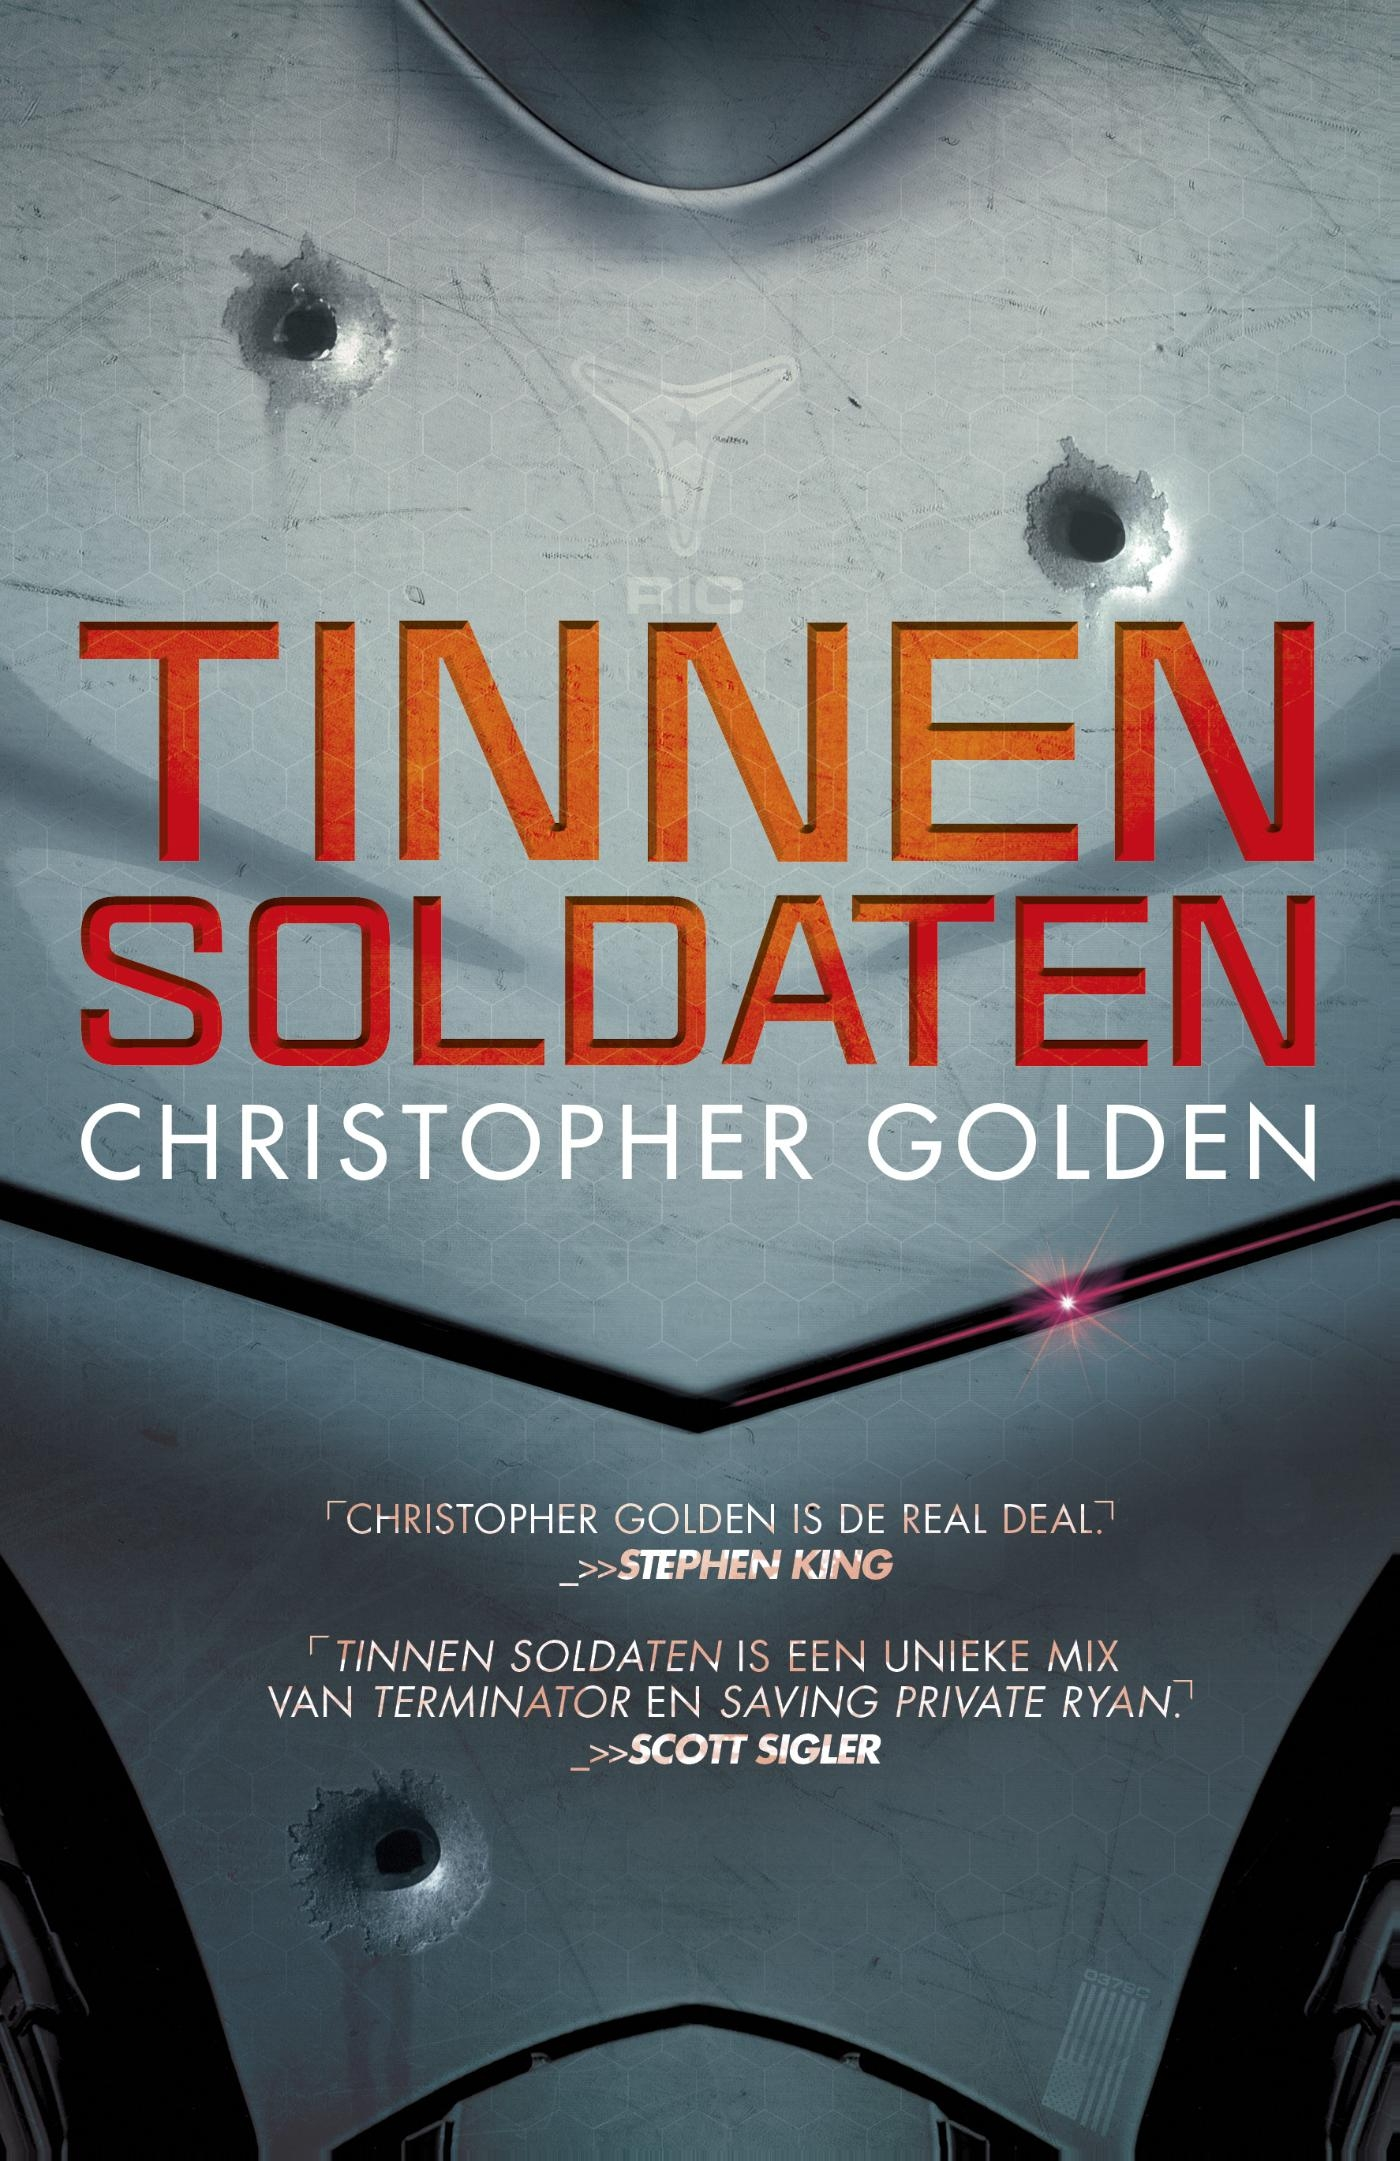 Tinnen soldaten – Christopher Golden